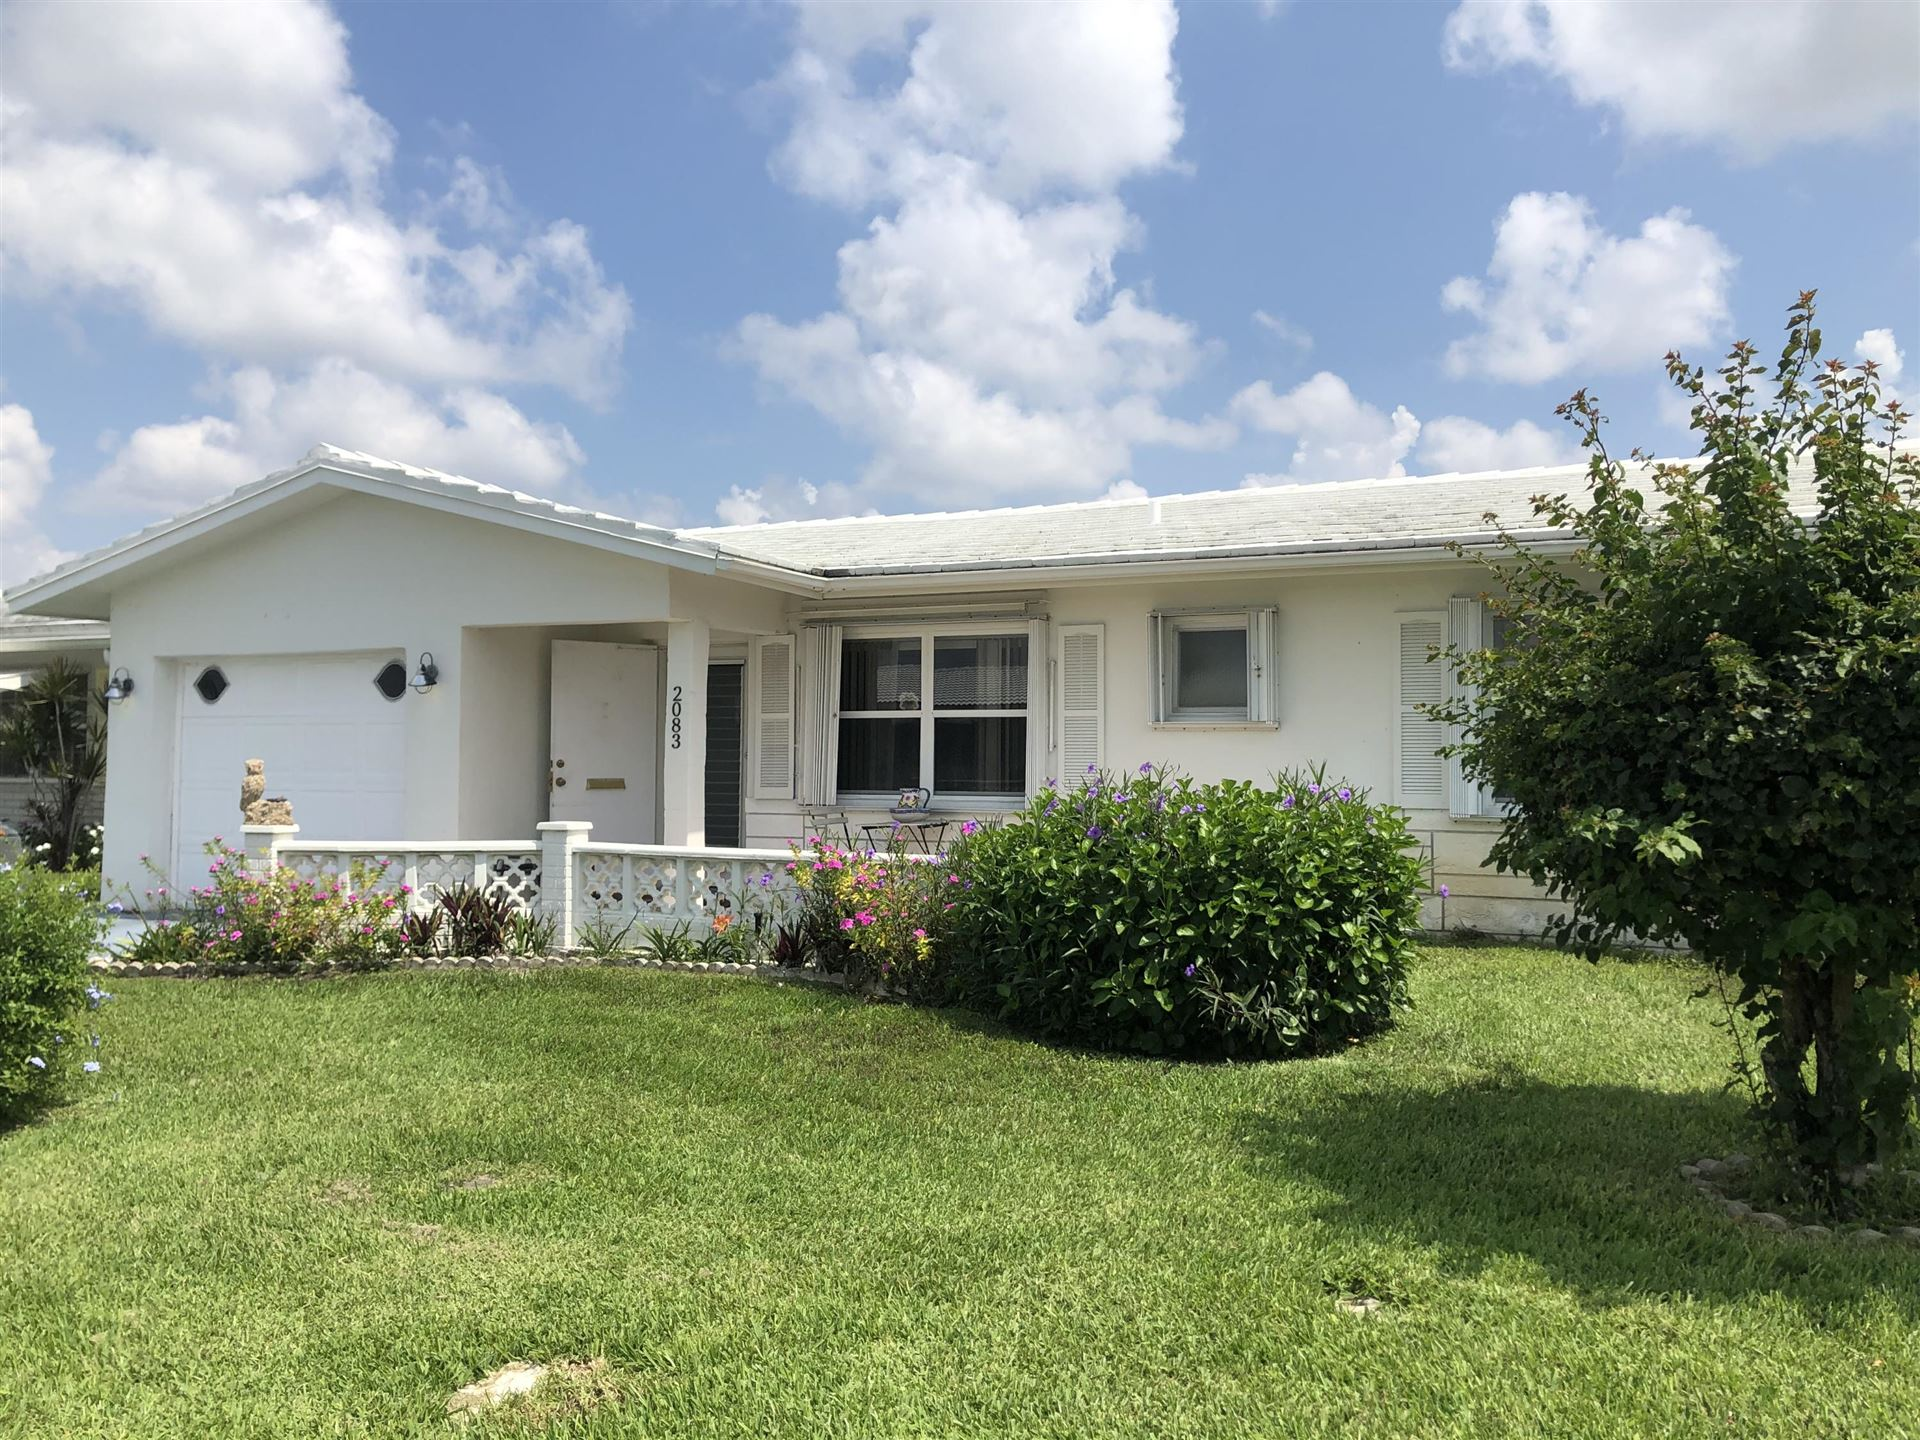 2083 SW 13th Terrace, Boynton Beach, FL 33426 - #: RX-10630067